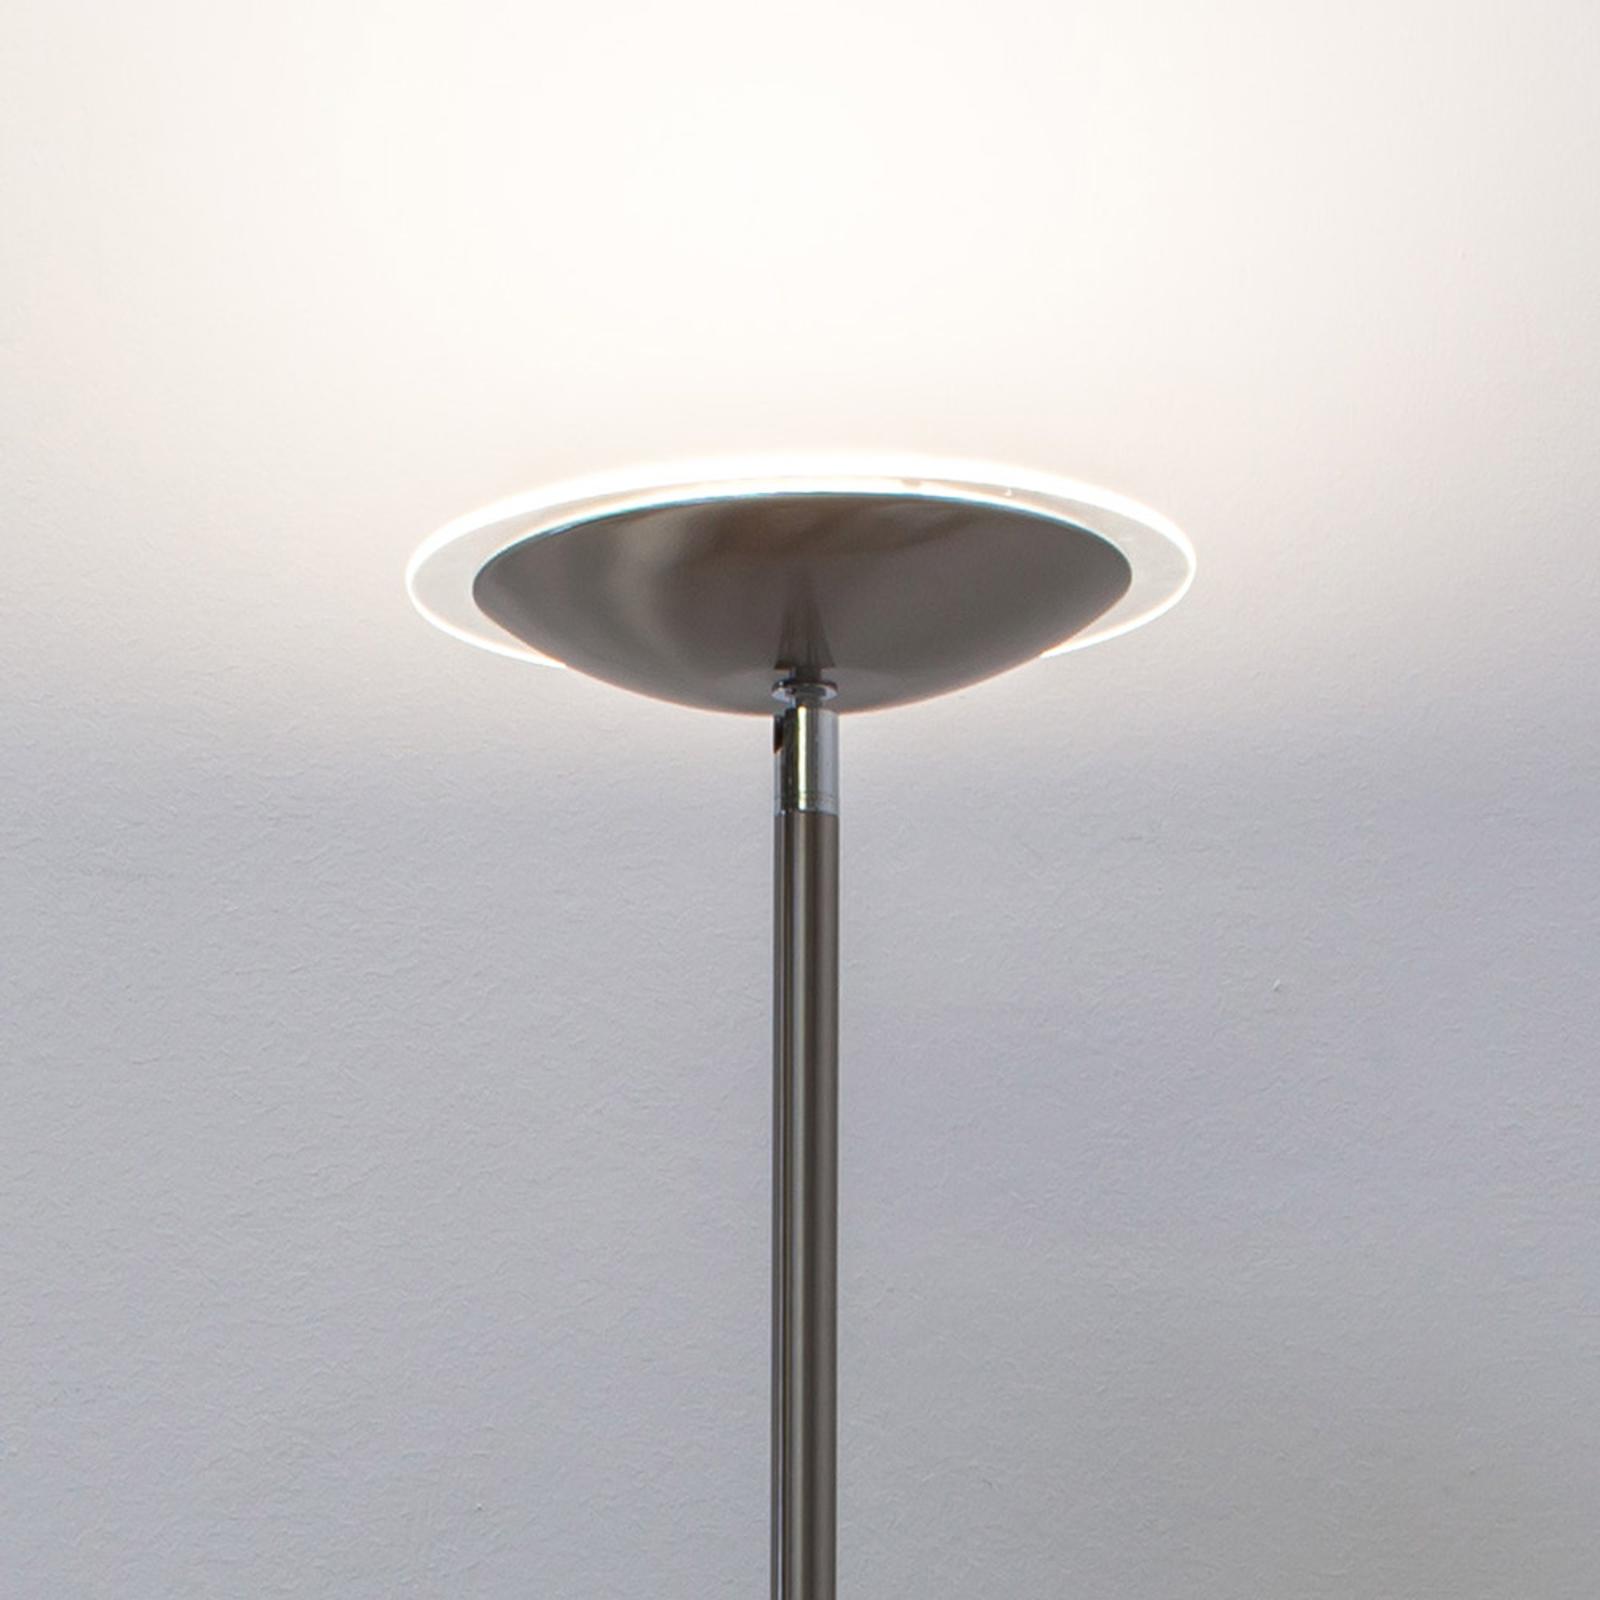 LED-uplight lampe Malea, mat nikkel